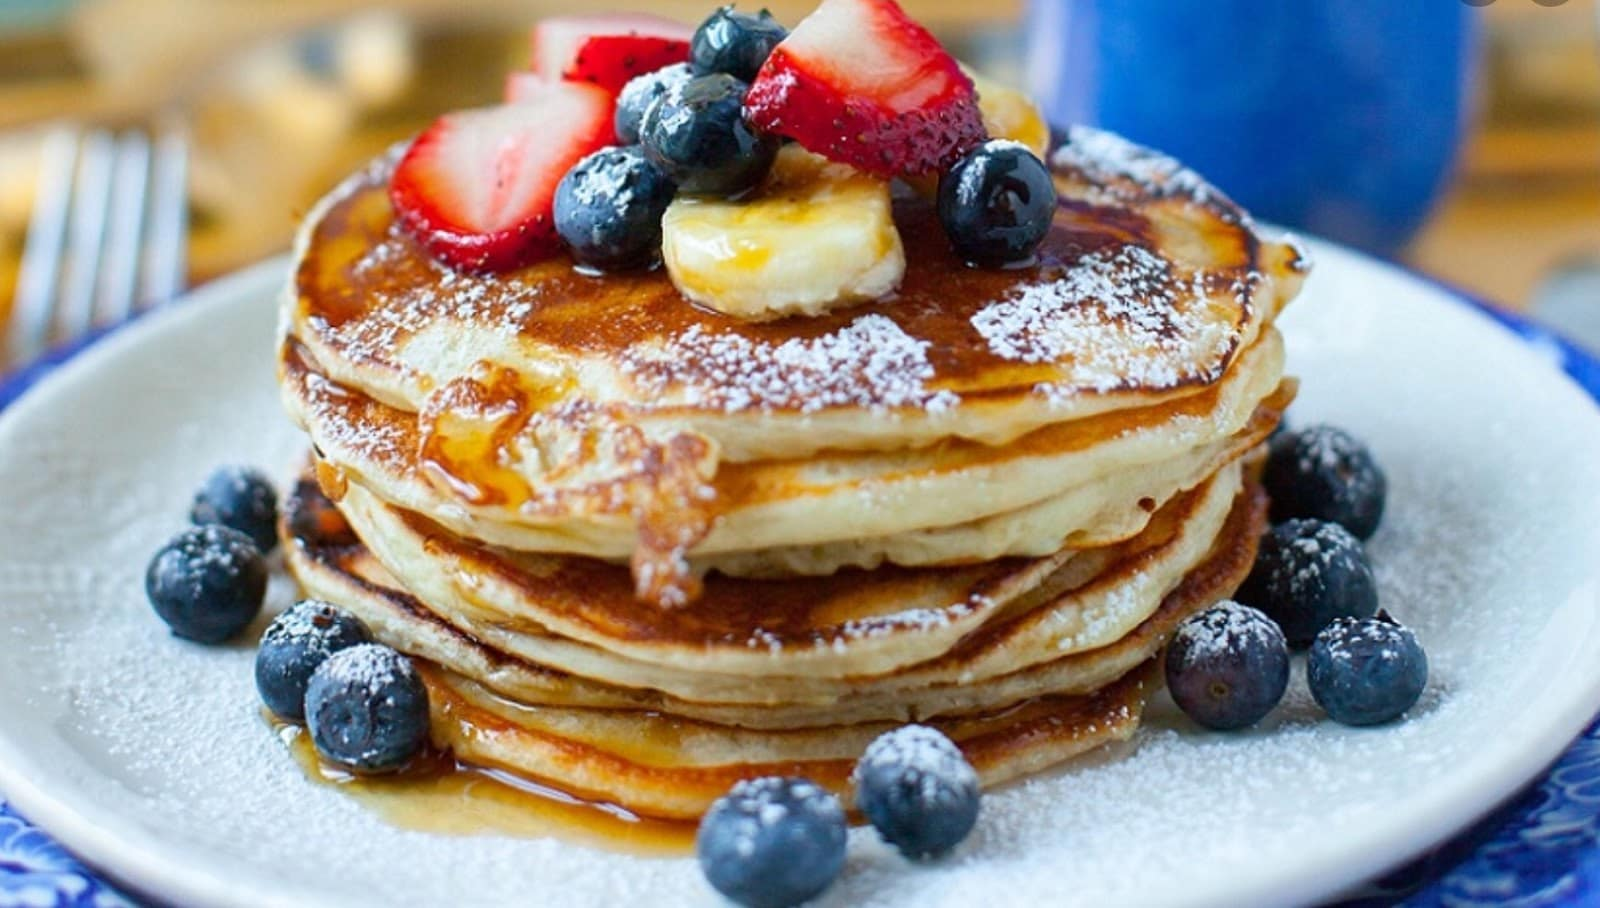 nyttiga pannkakor med proteinpulver